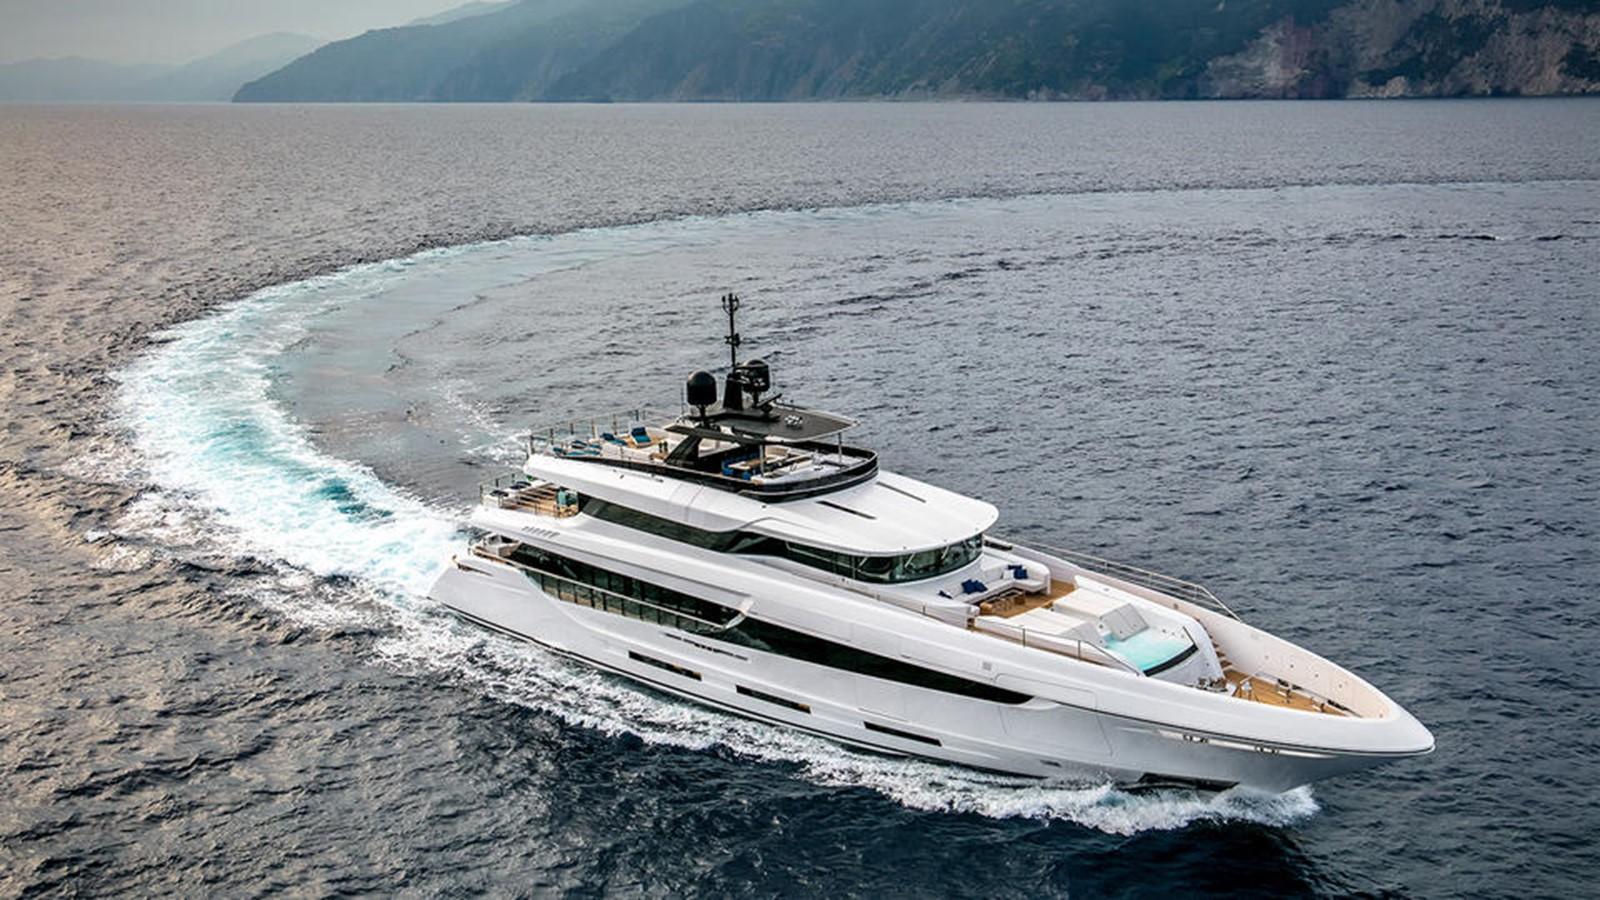 Namaste yacht for sale